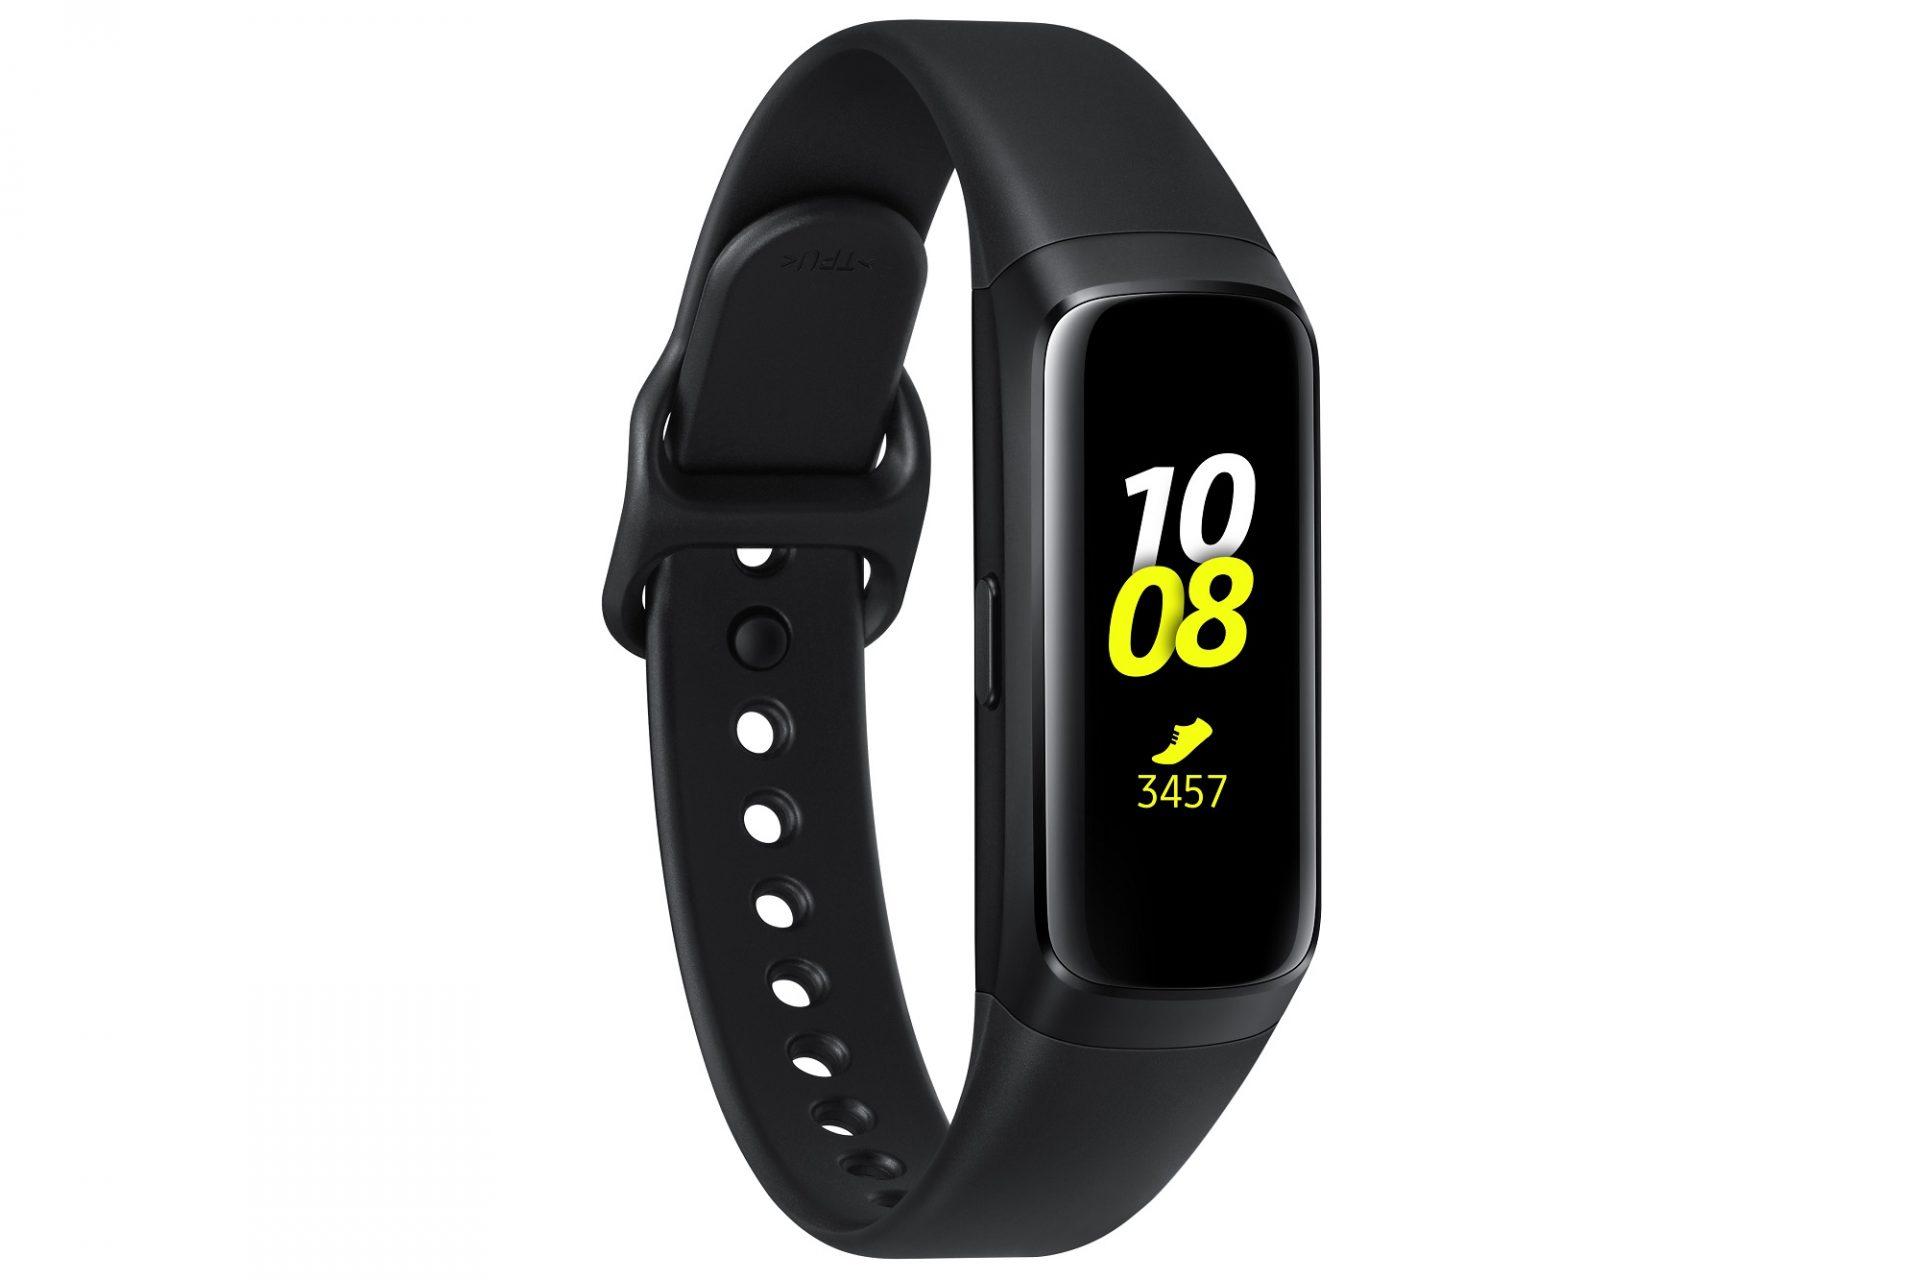 фитнес-трекер от Samsung